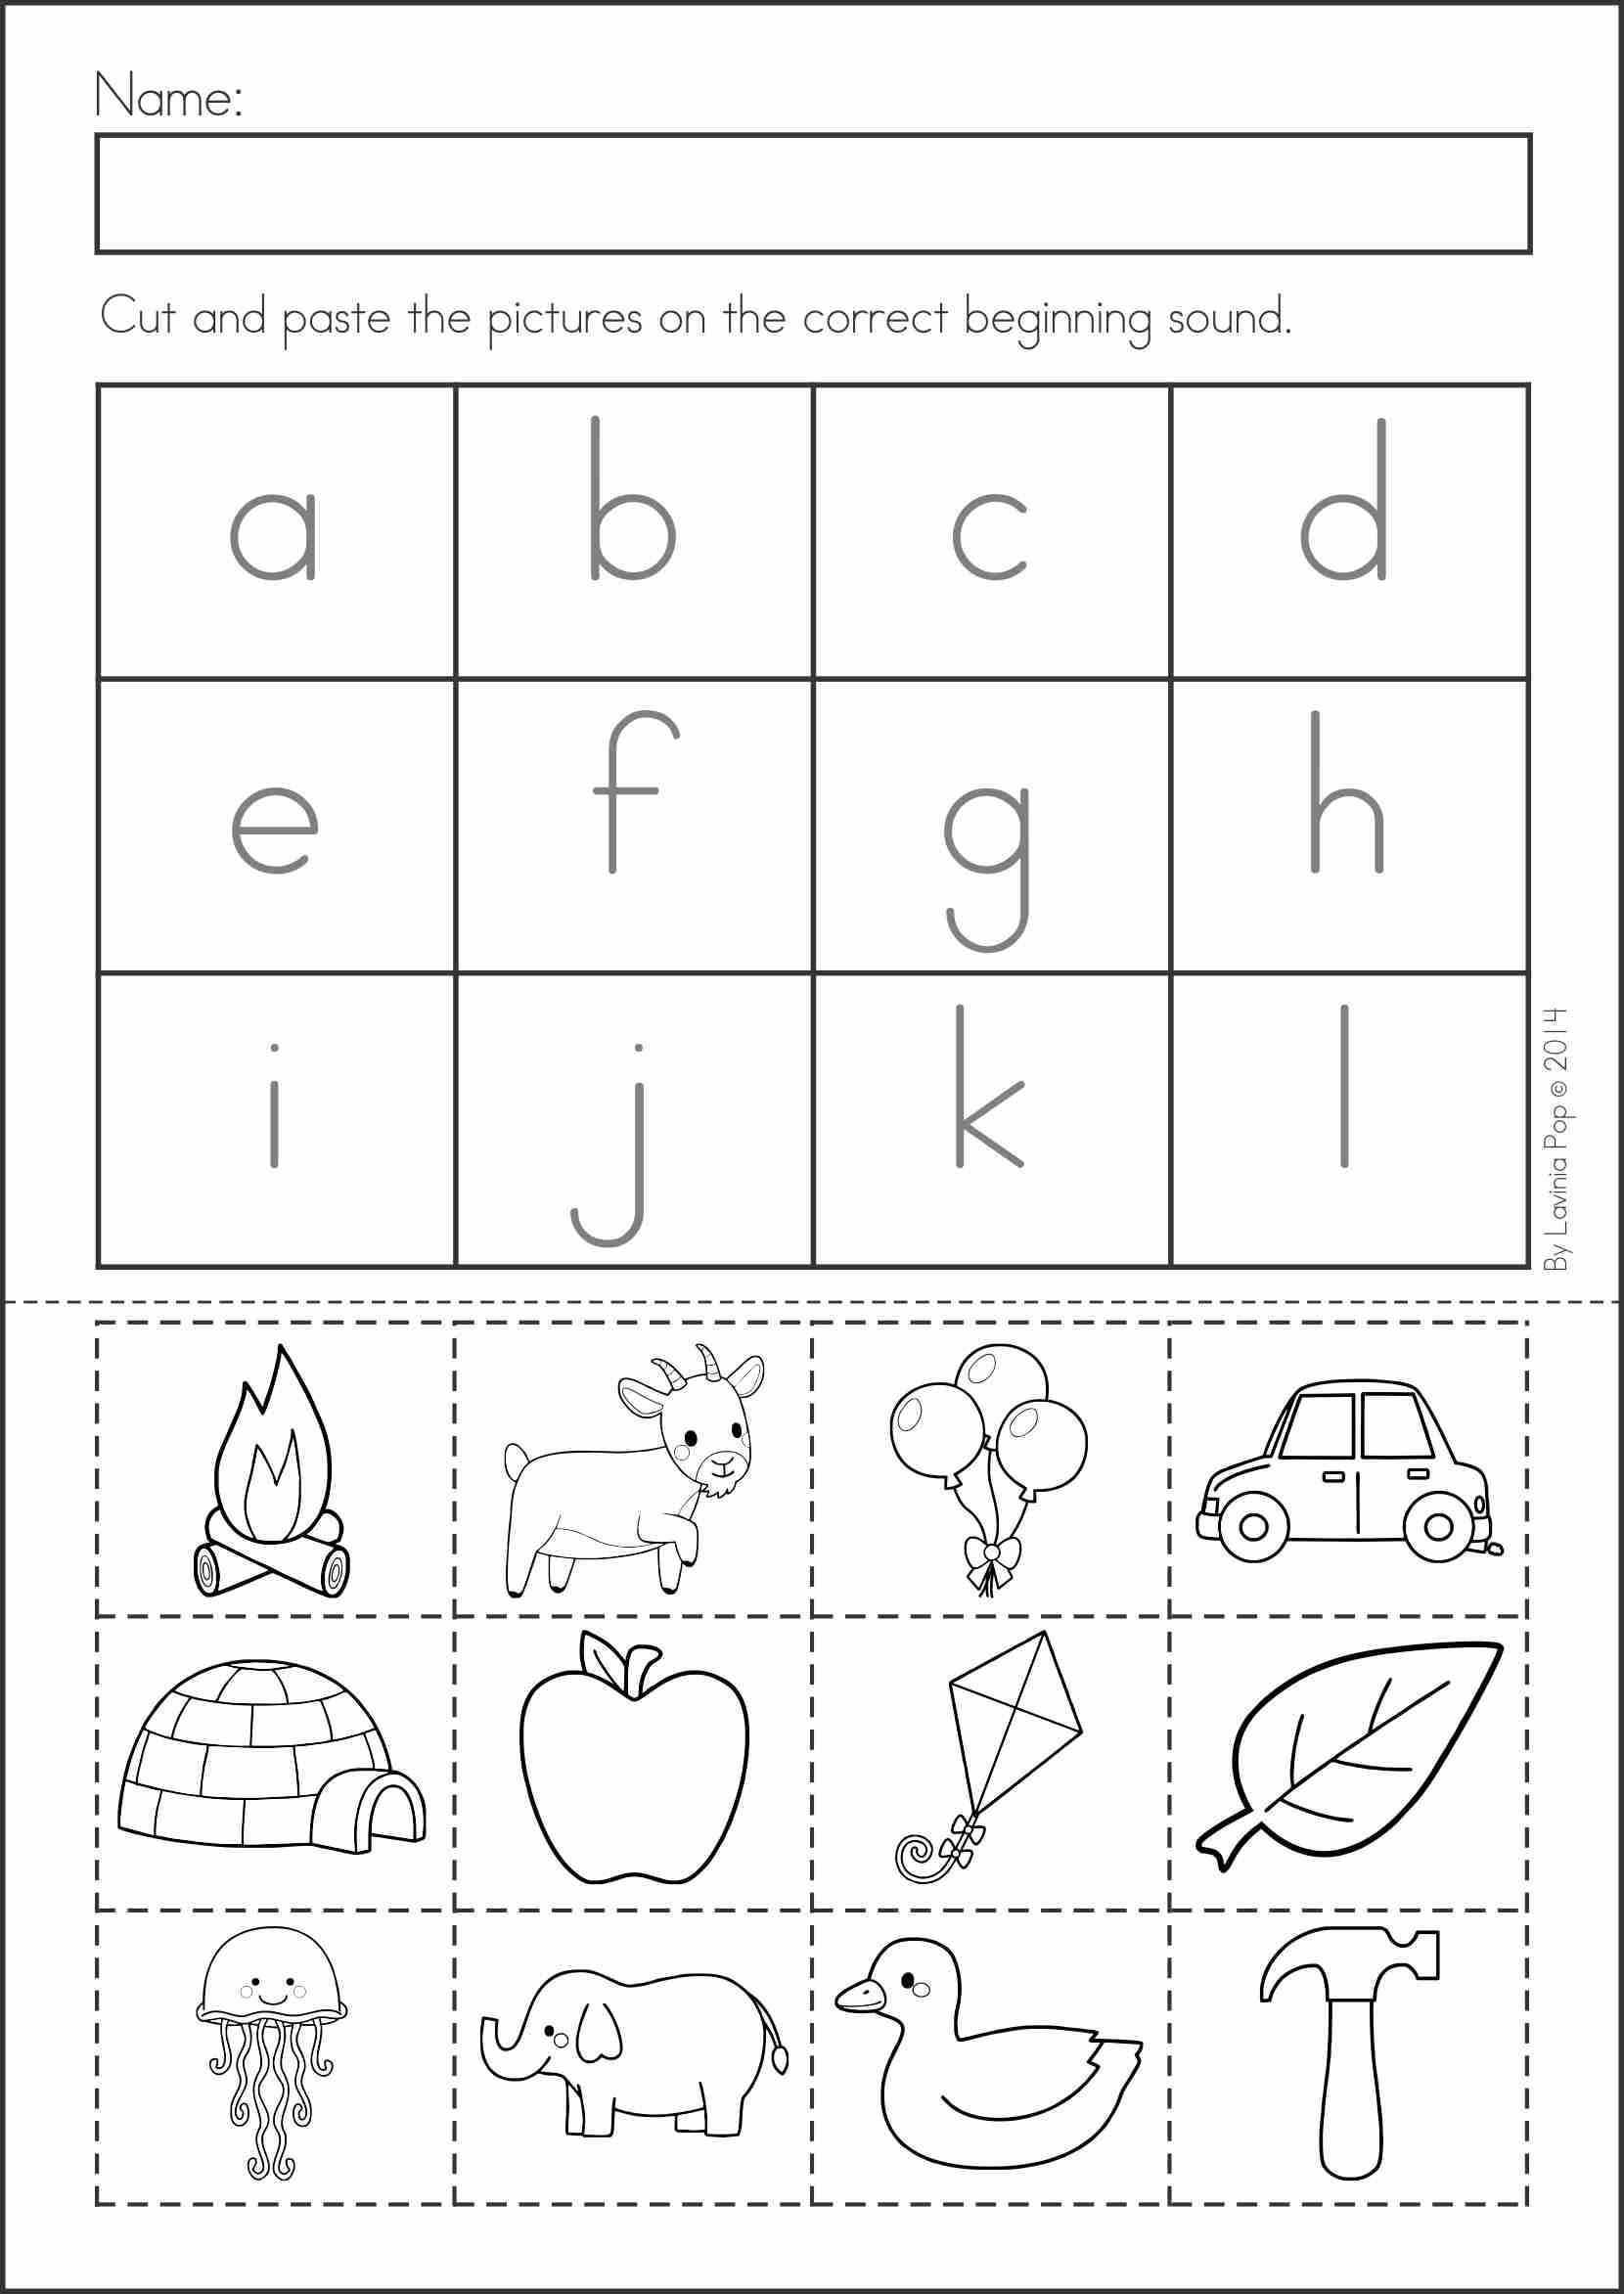 Letter Cut And Paste Worksheet | Printable Worksheets And within Alphabet Worksheets Cut And Paste